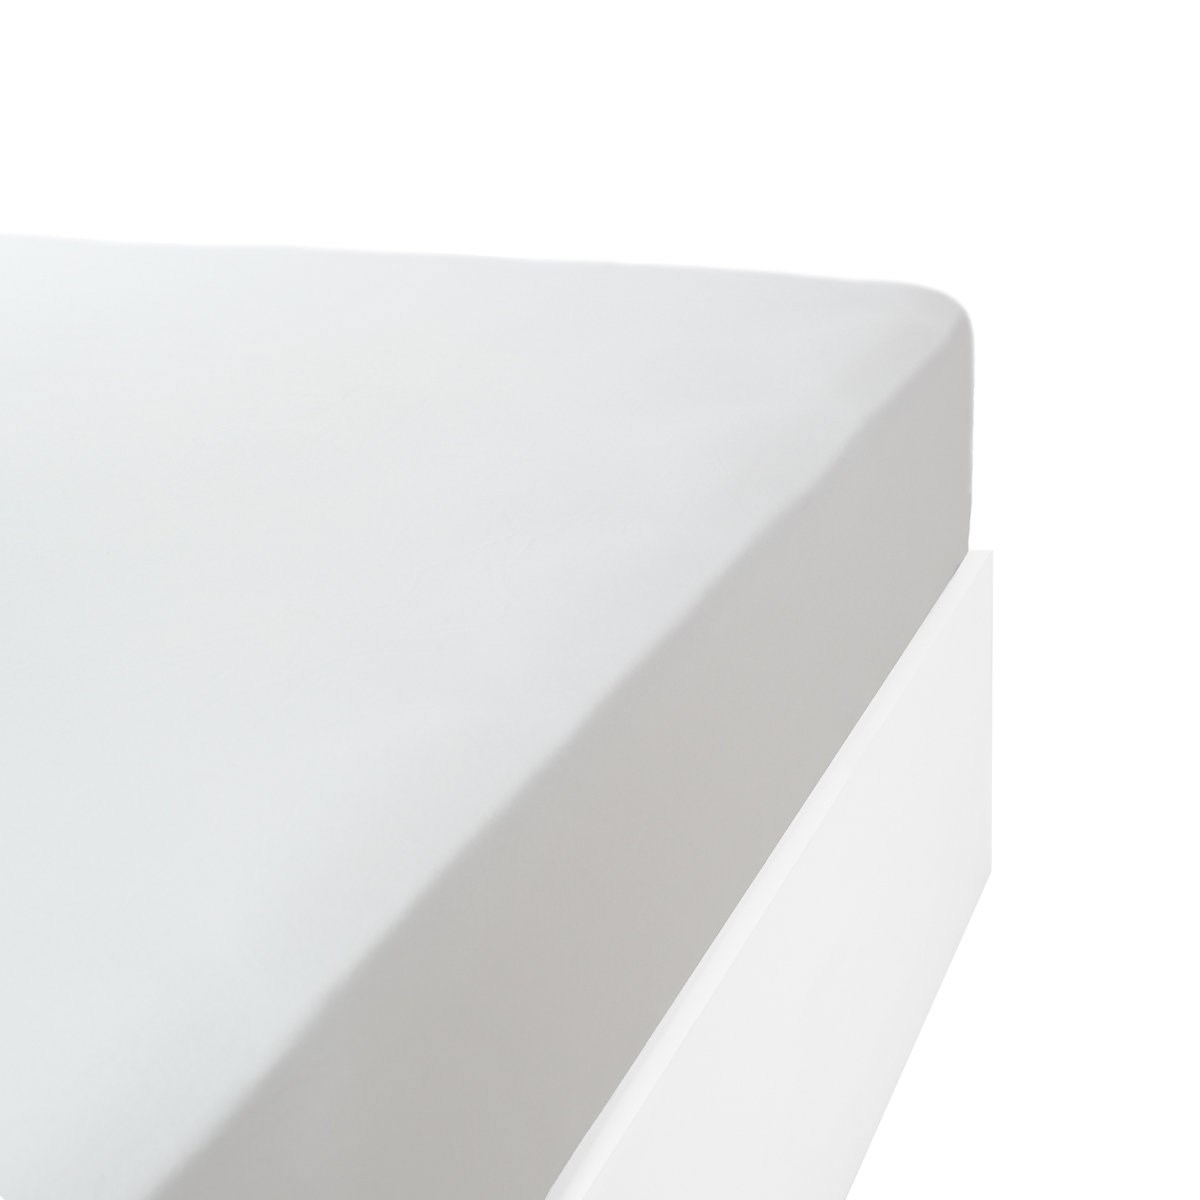 Drap housse jersey extensible en coton blanc 80x190 cm